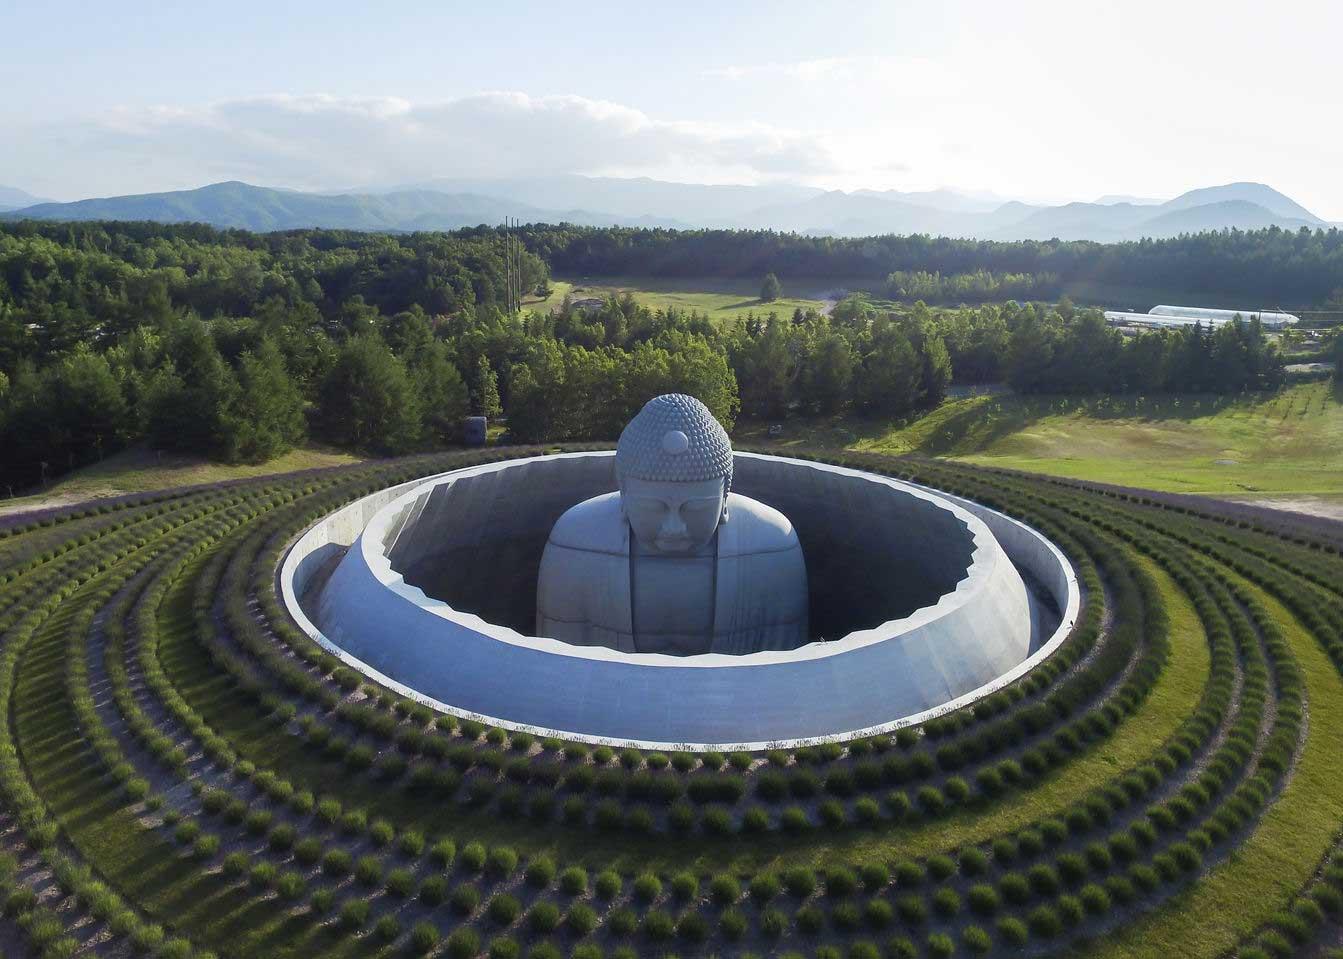 © Shigeo Ogawa, The Hill of the Buddha by Tadao Ando, 2016